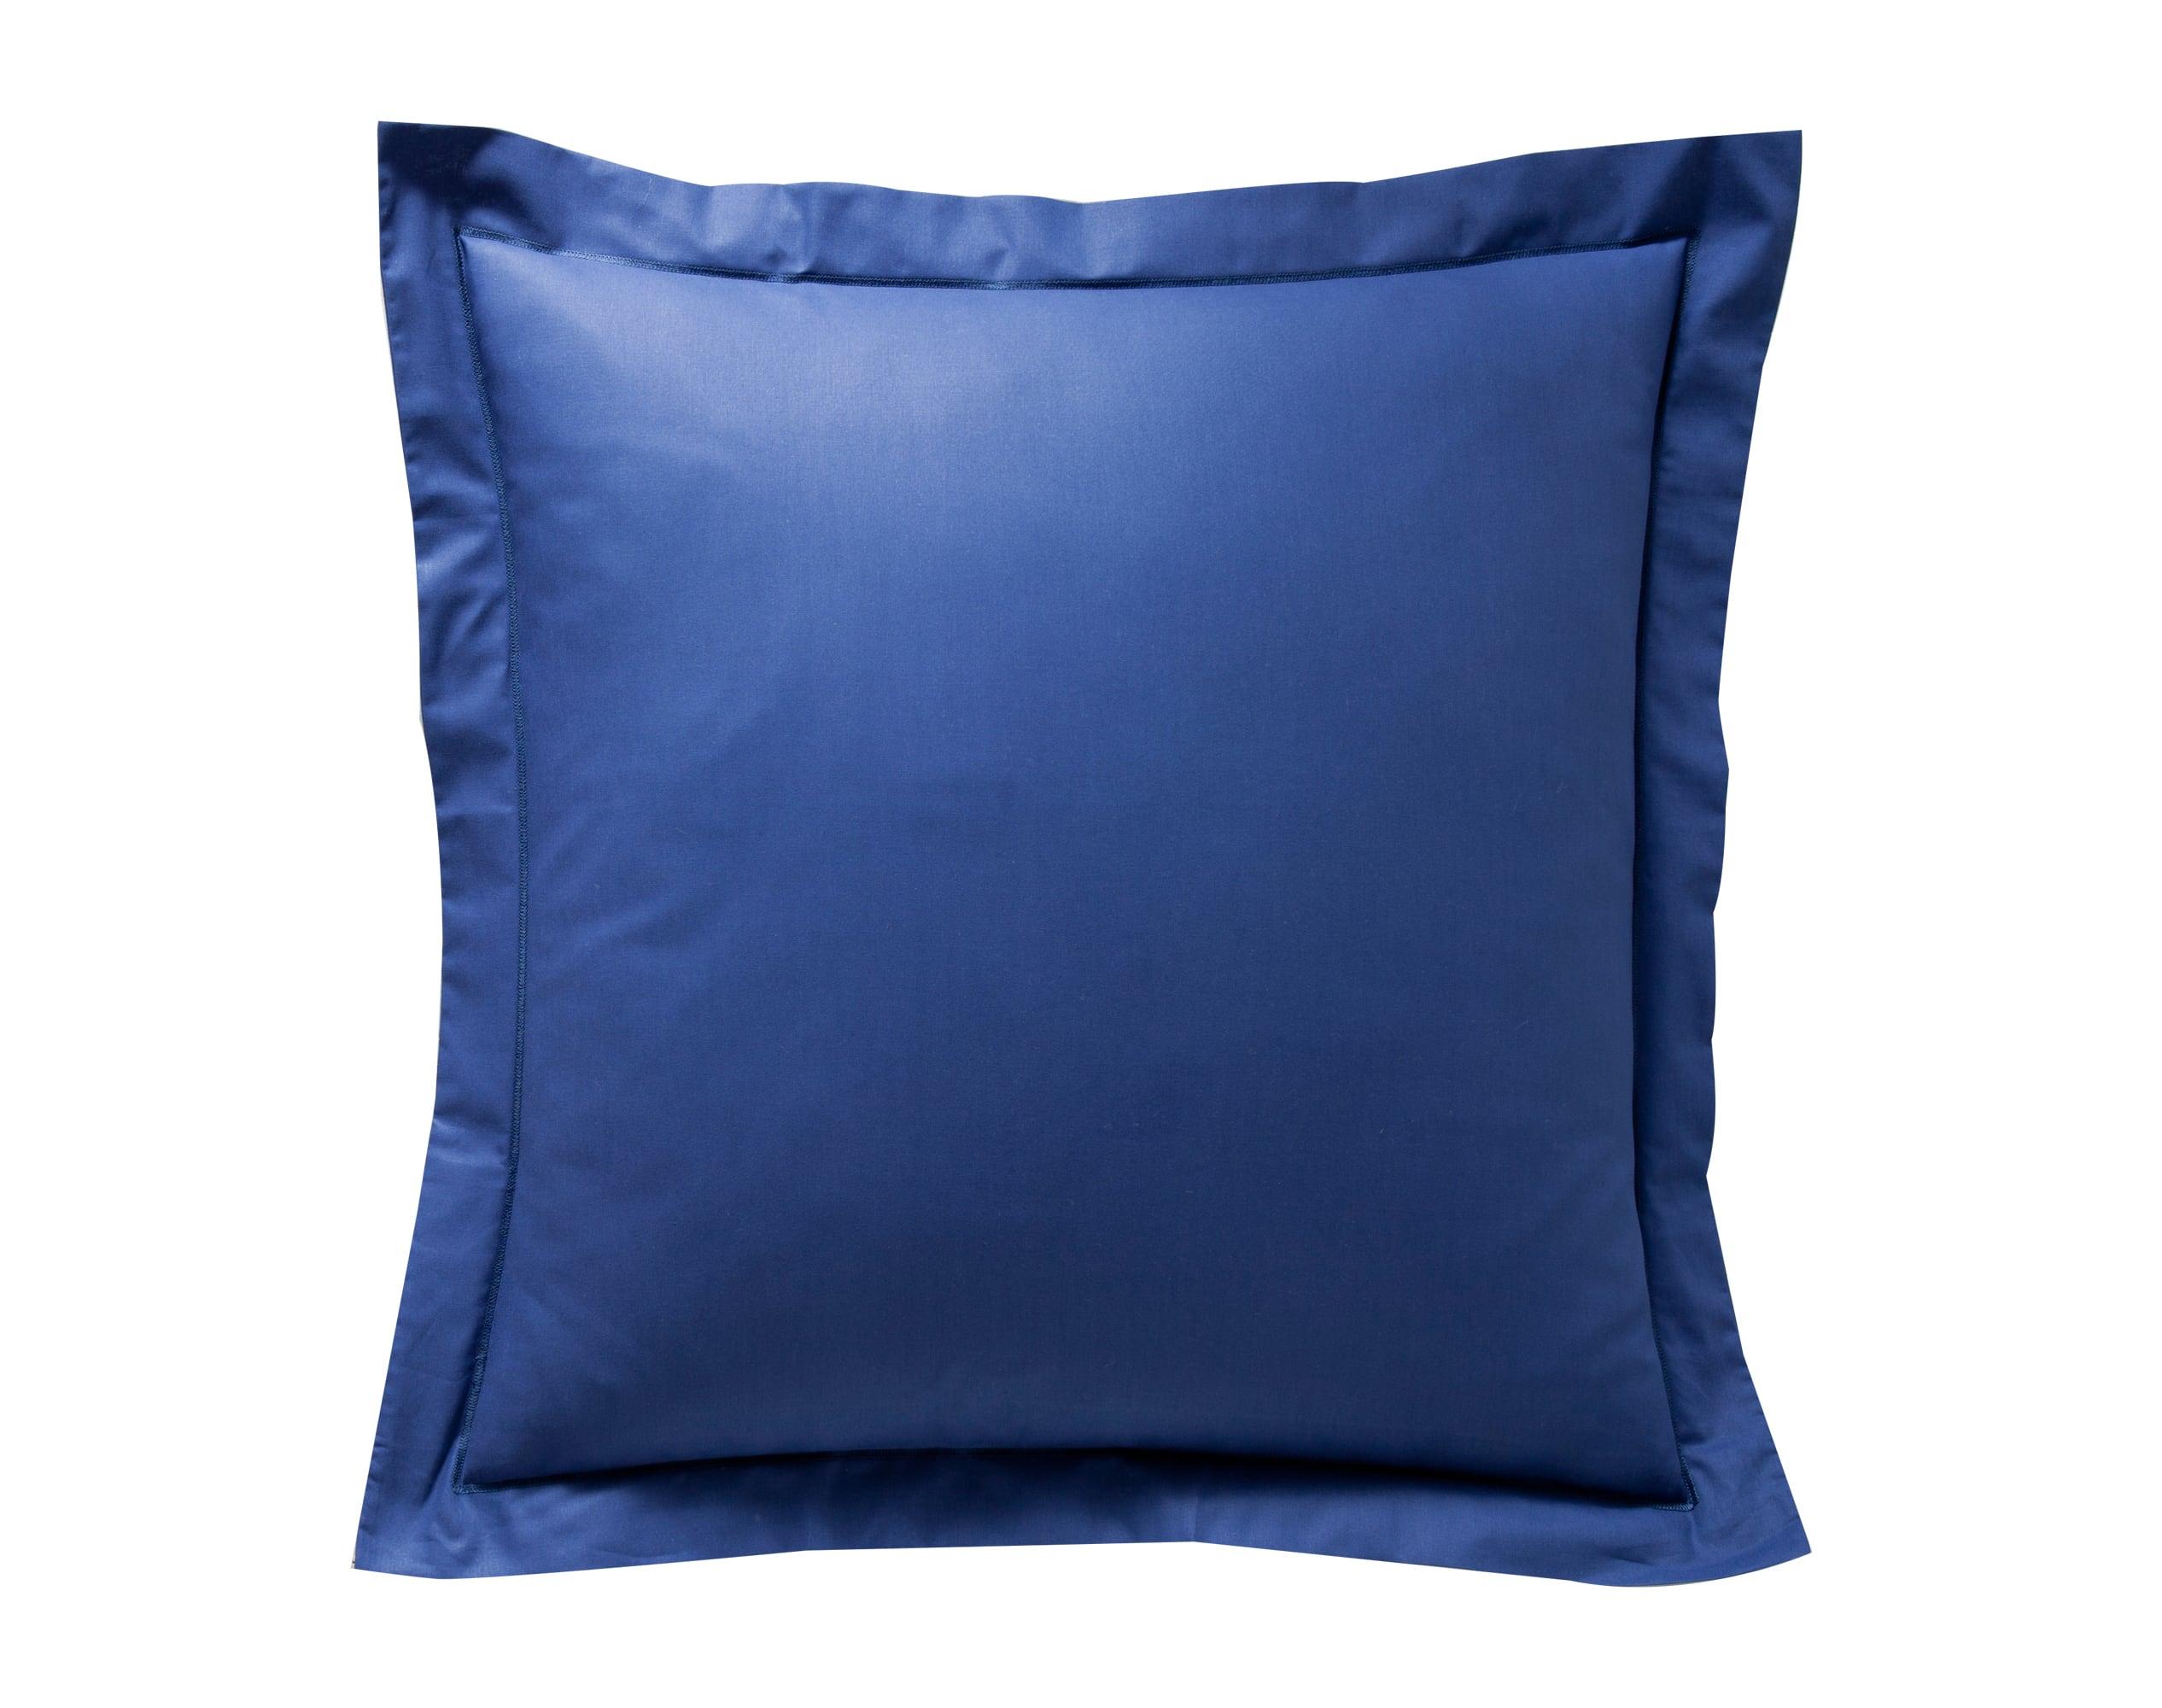 Taie d'oreiller 50x70 en coton bleu marine